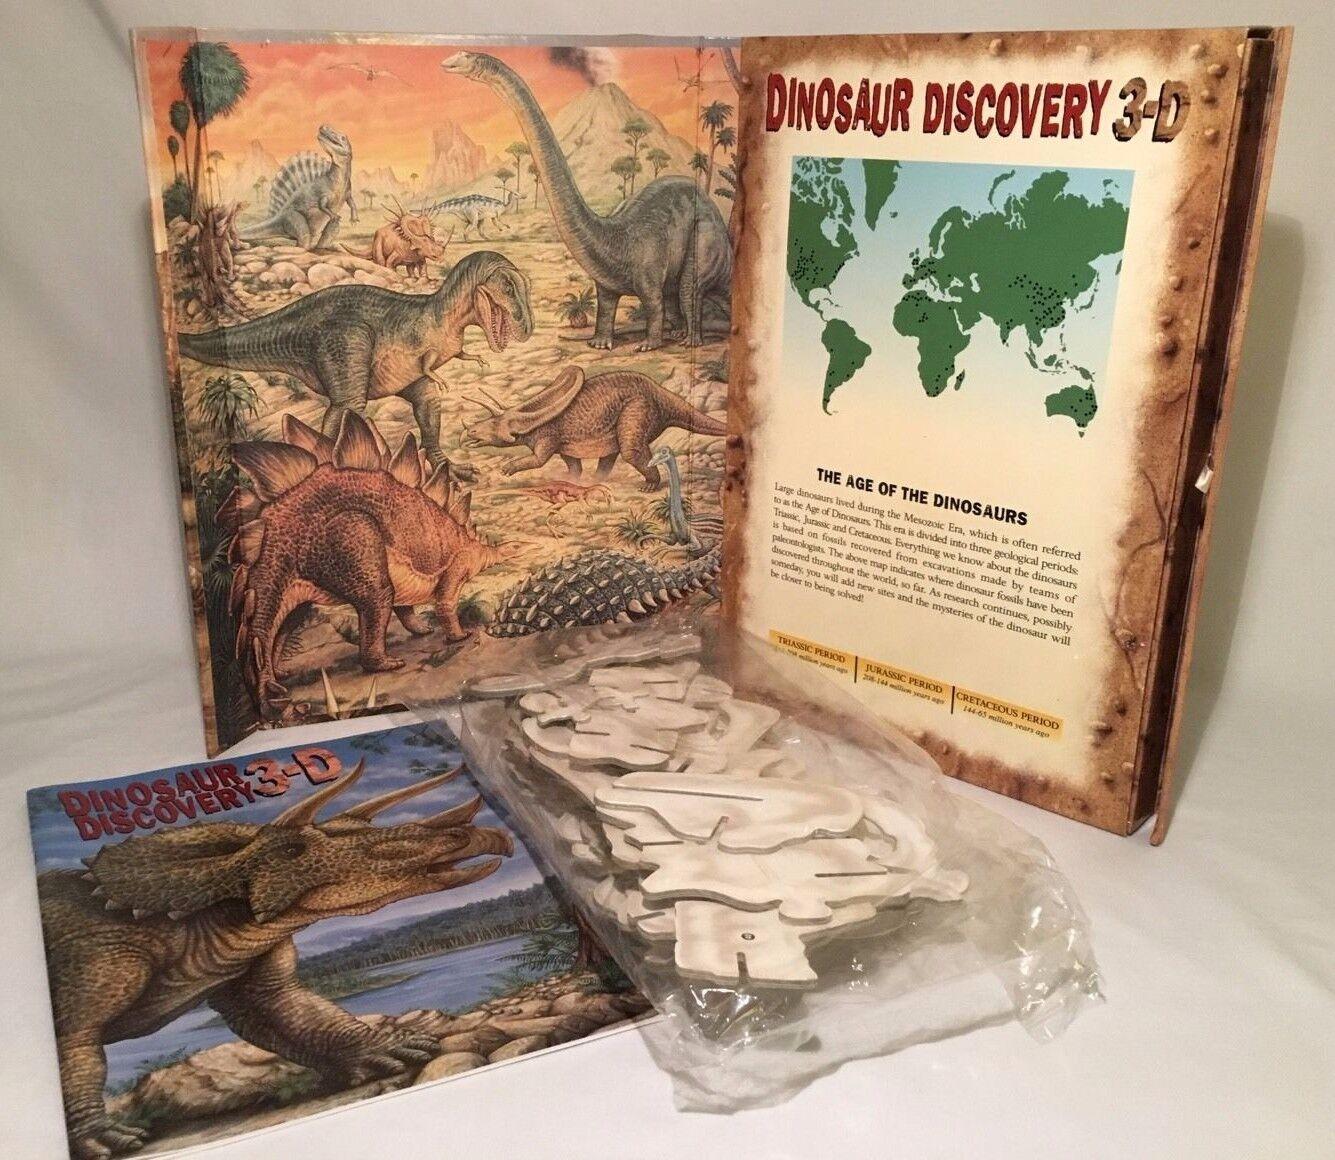 Dinosaurier - skelett - modell 51 entdeckung stehen 51 modell st  ck velociraptor puzzle 2 ft 3305c9